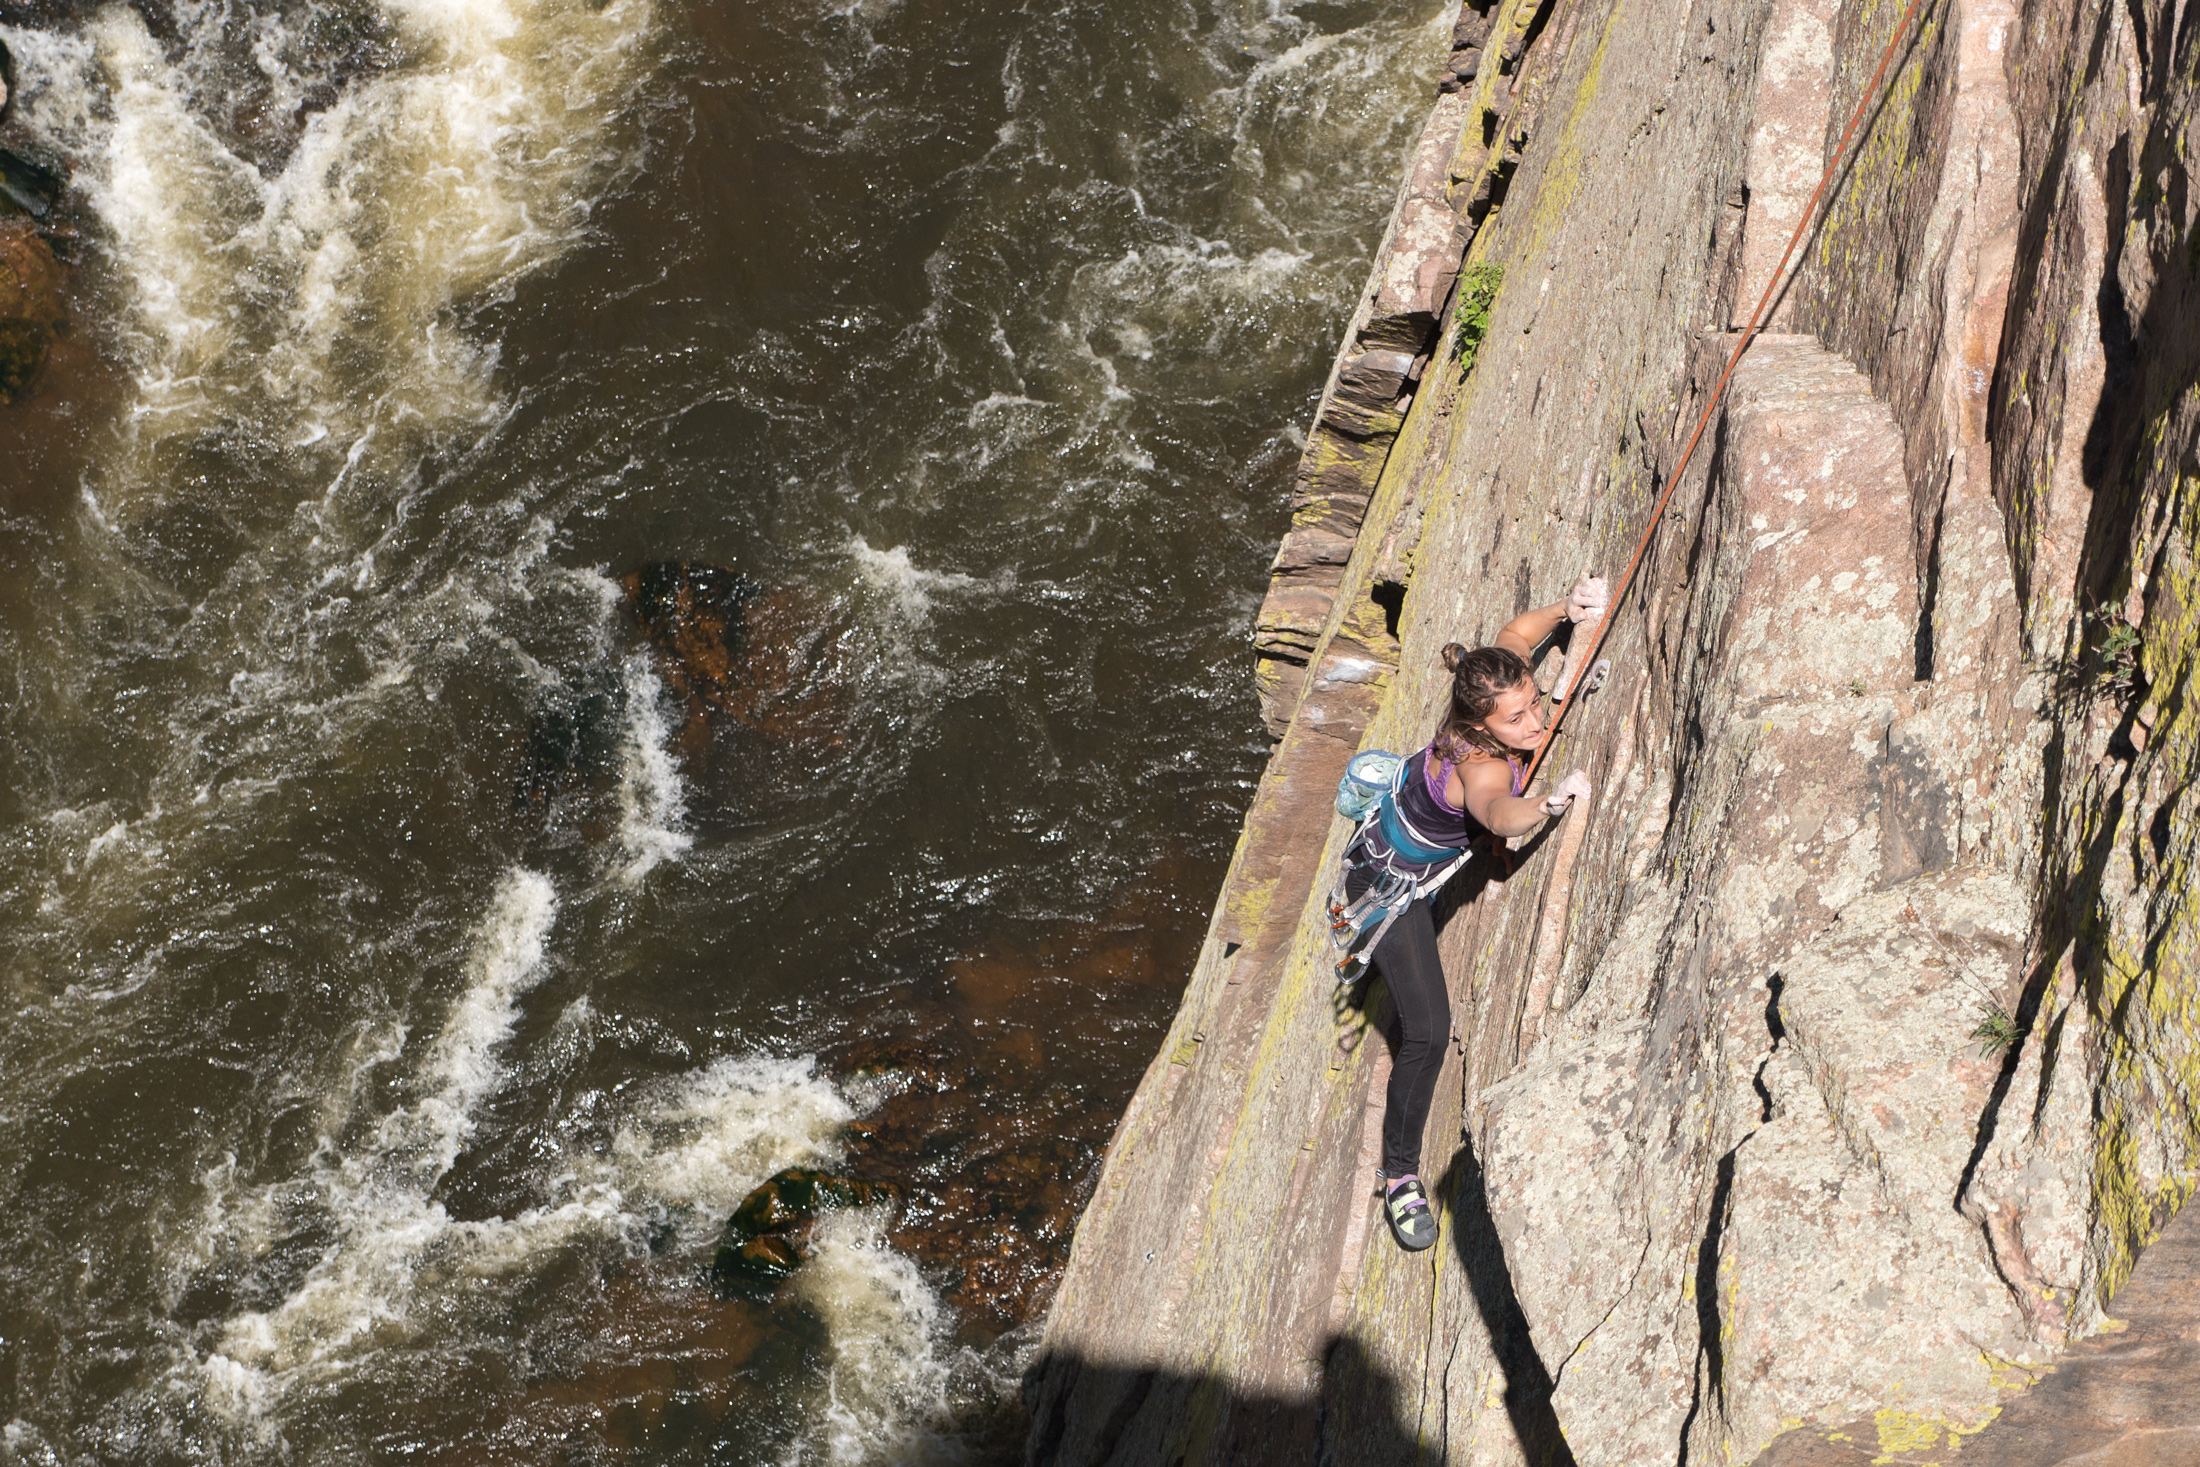 colorado-climbing-2017-1030854-web.jpg